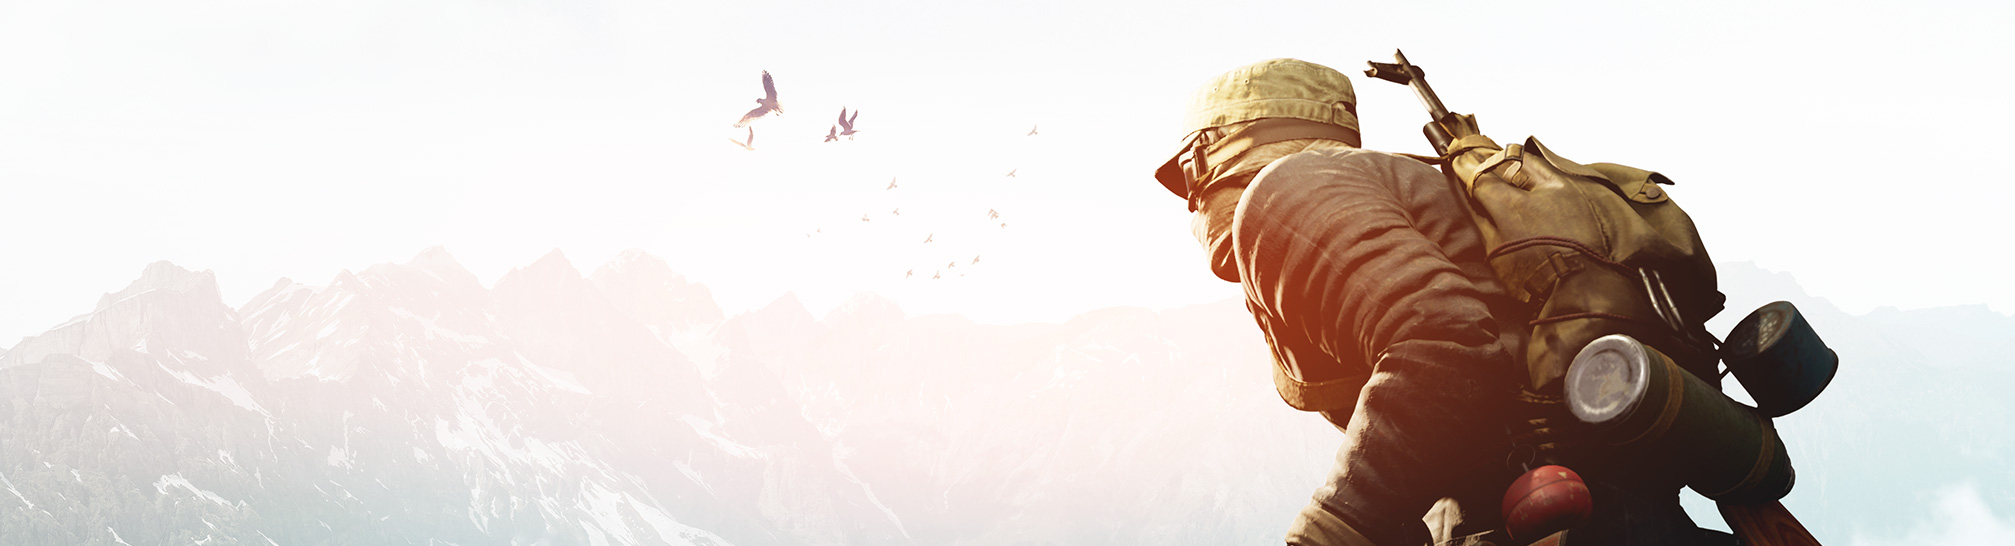 WEBSITE GAME PREVIEW TRAILER Bohemia